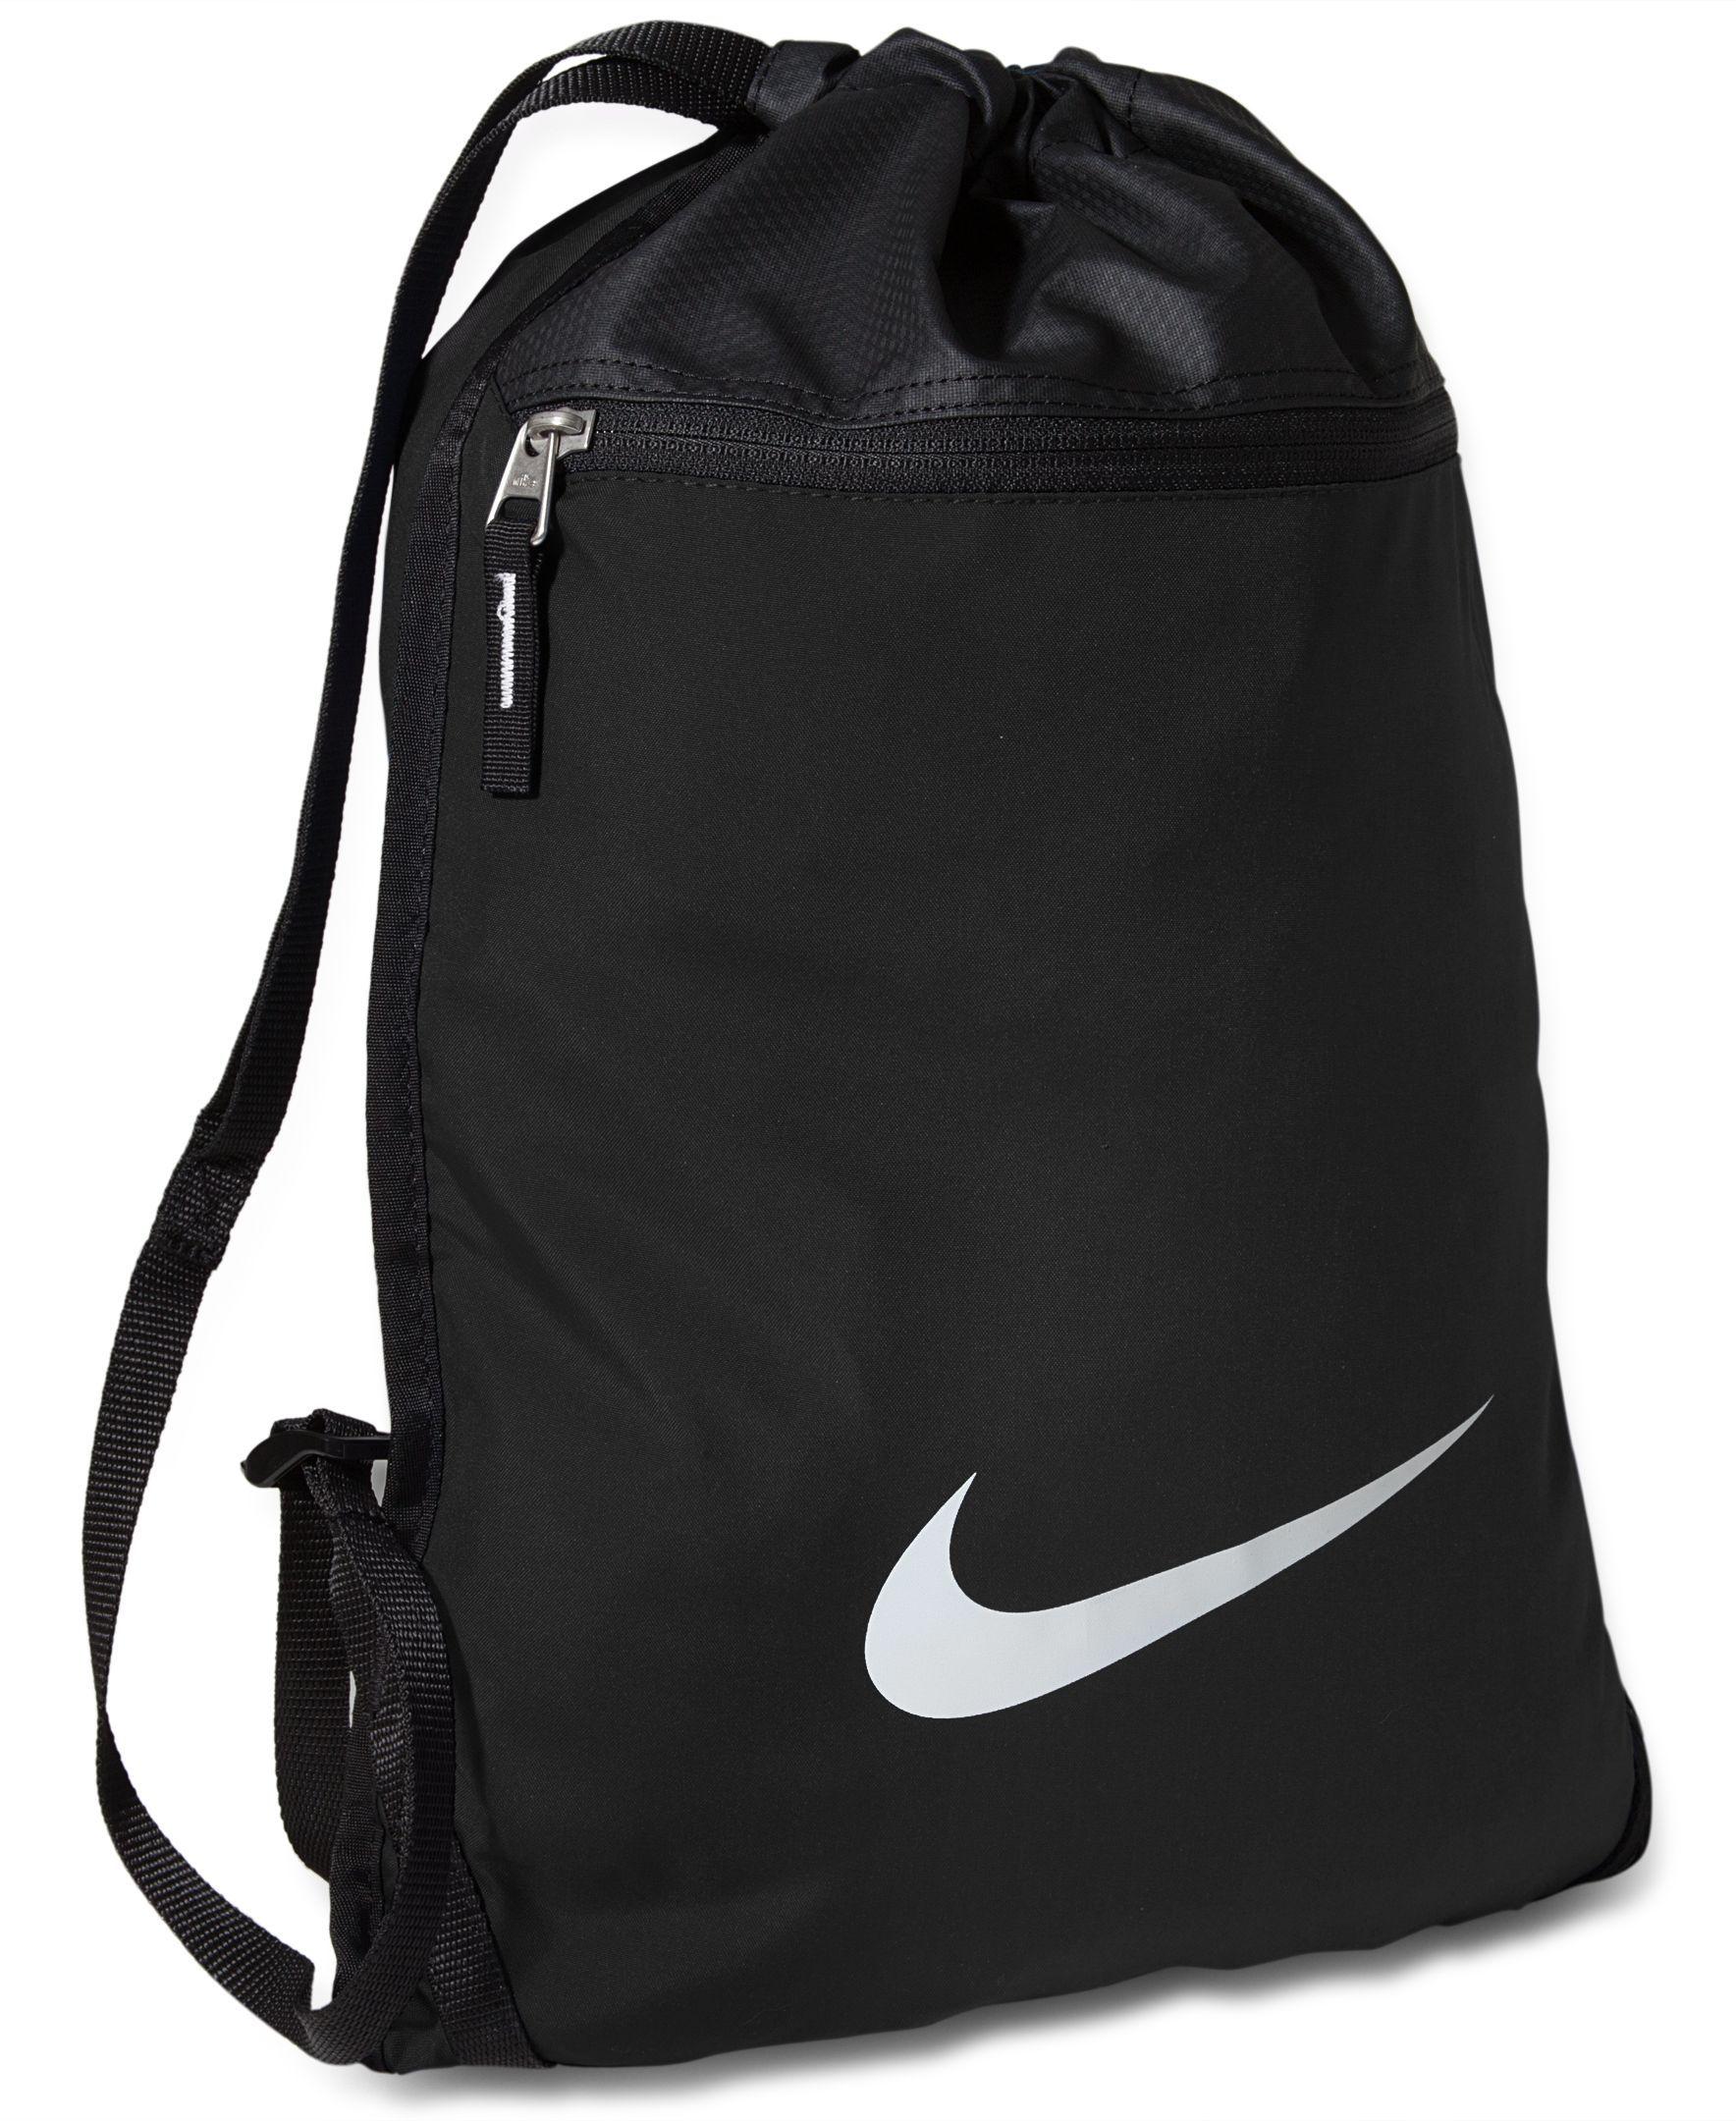 4bc5780bd02 Nike Accessories, Team Training Gymsack Bag Mens Tote Bag, Mens Gym Bag, Bag